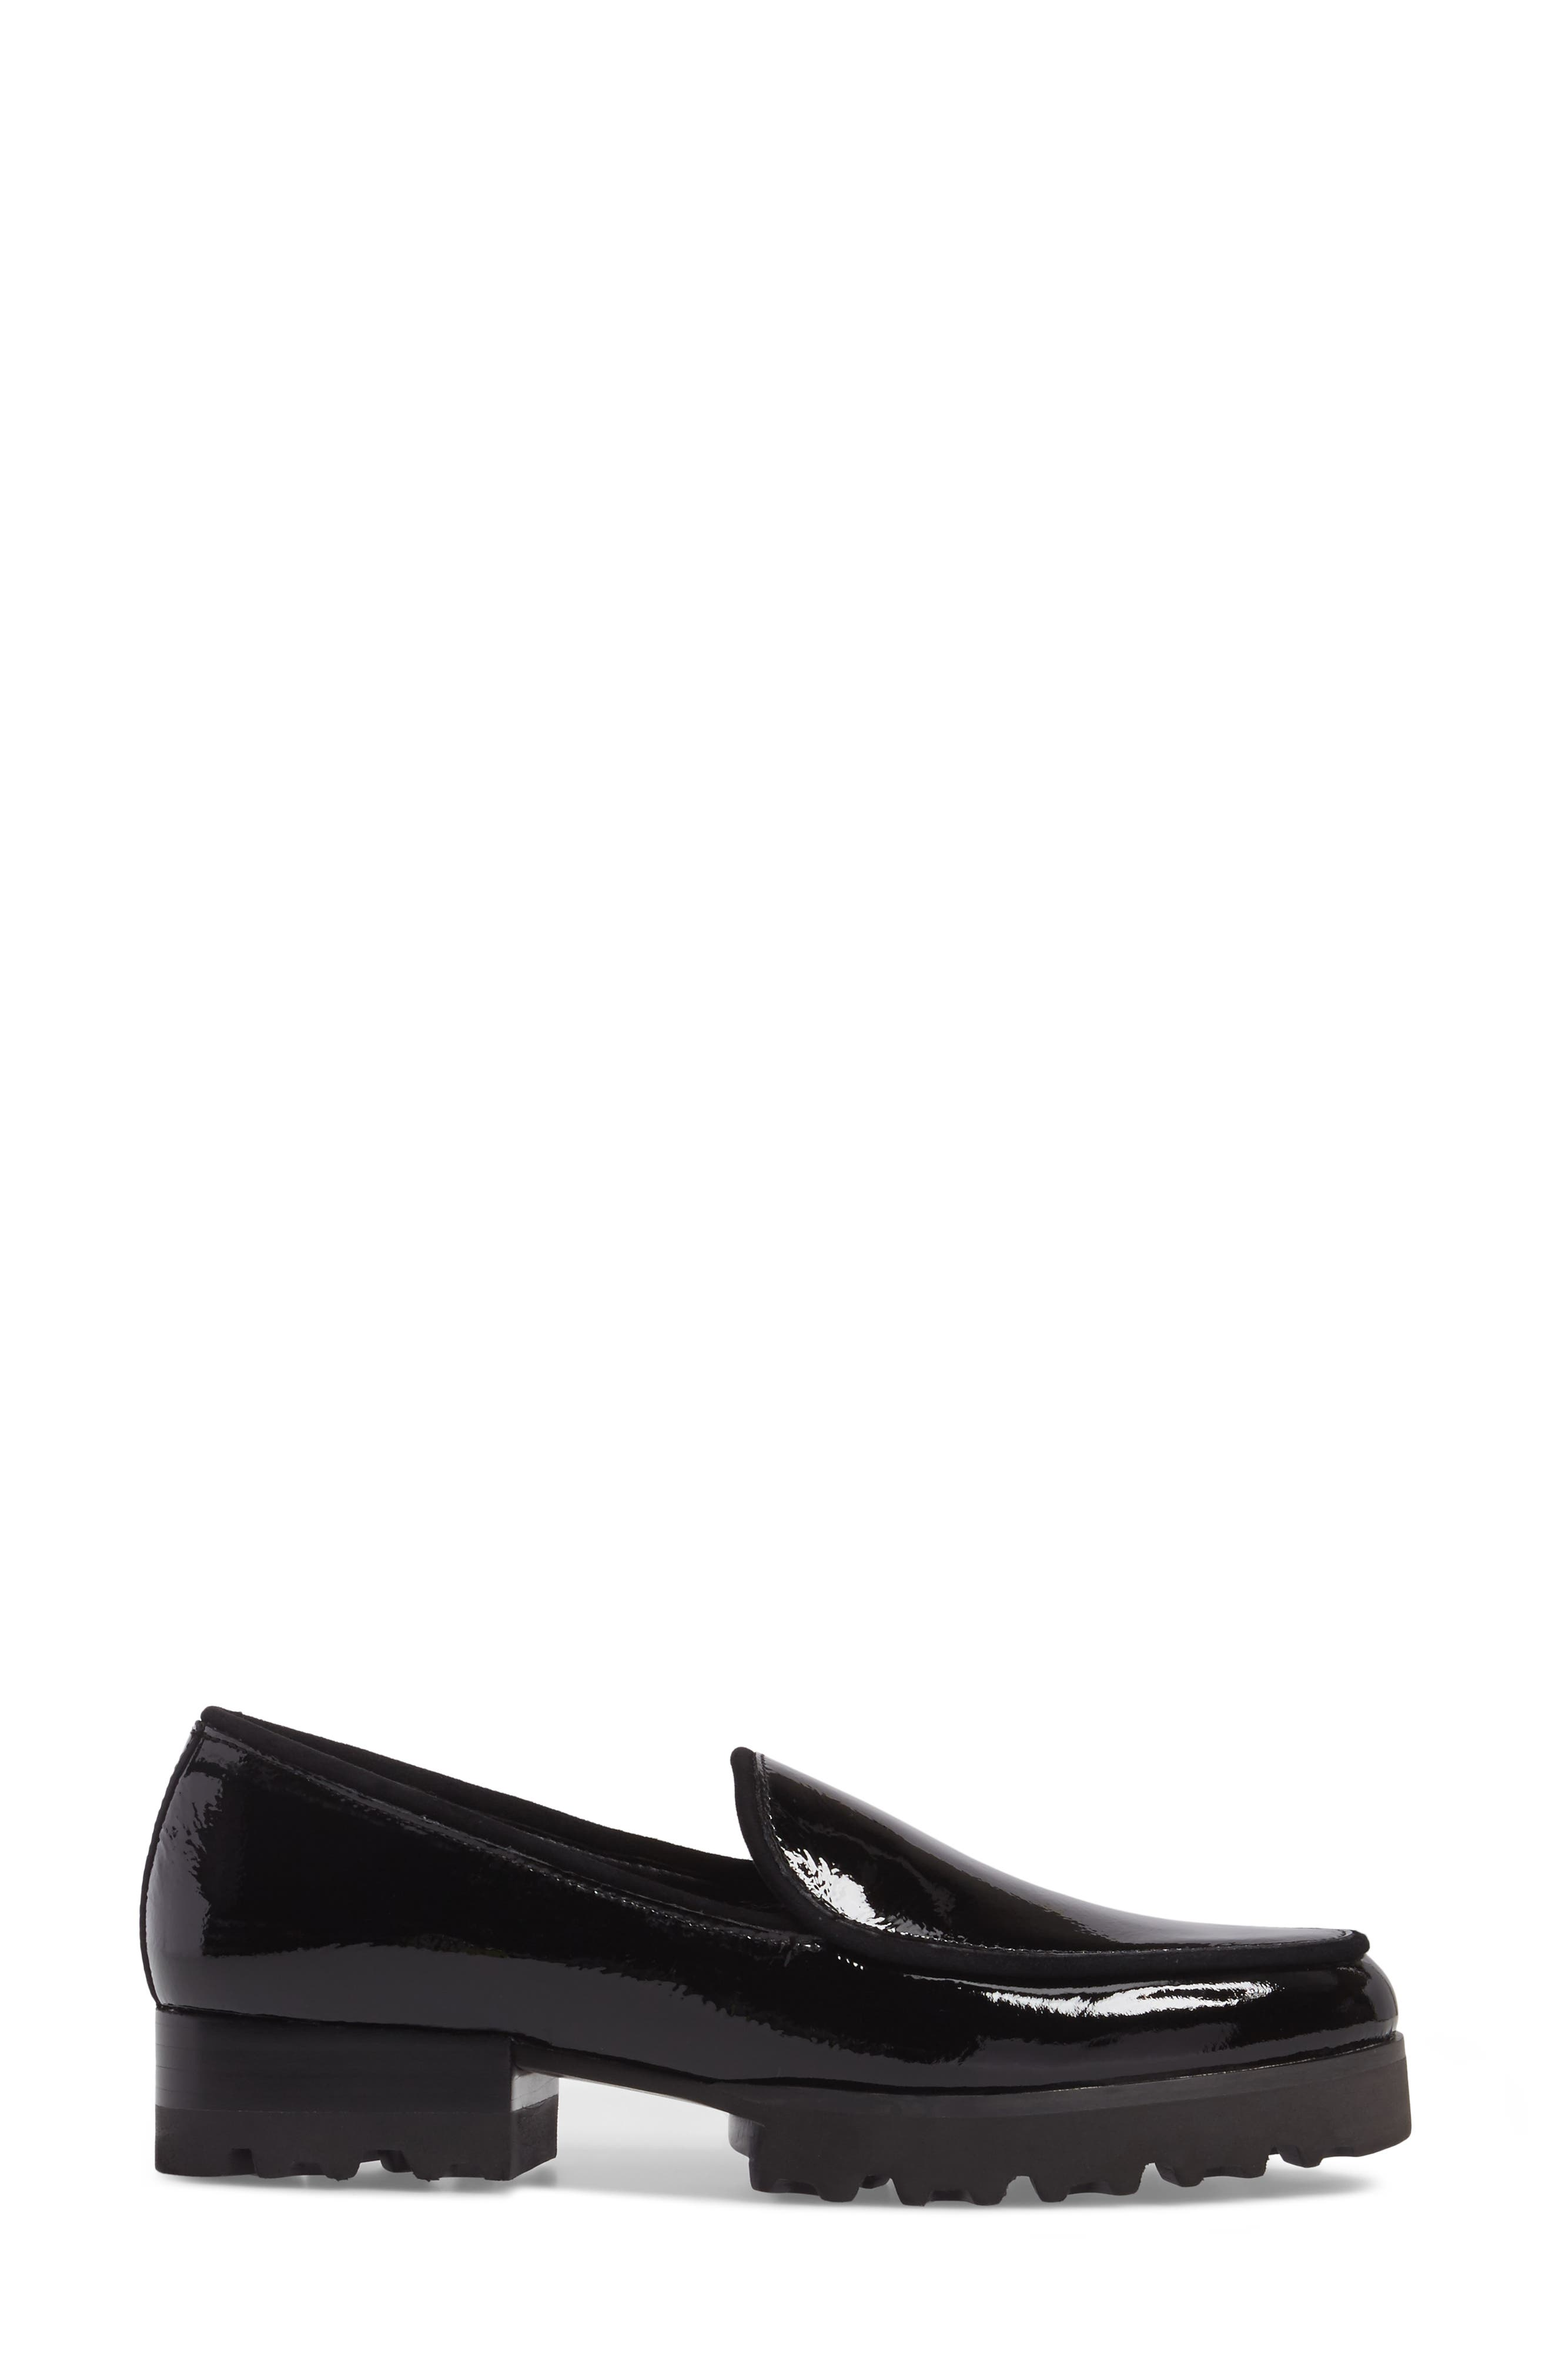 Elen Loafer,                             Alternate thumbnail 3, color,                             Black Leather